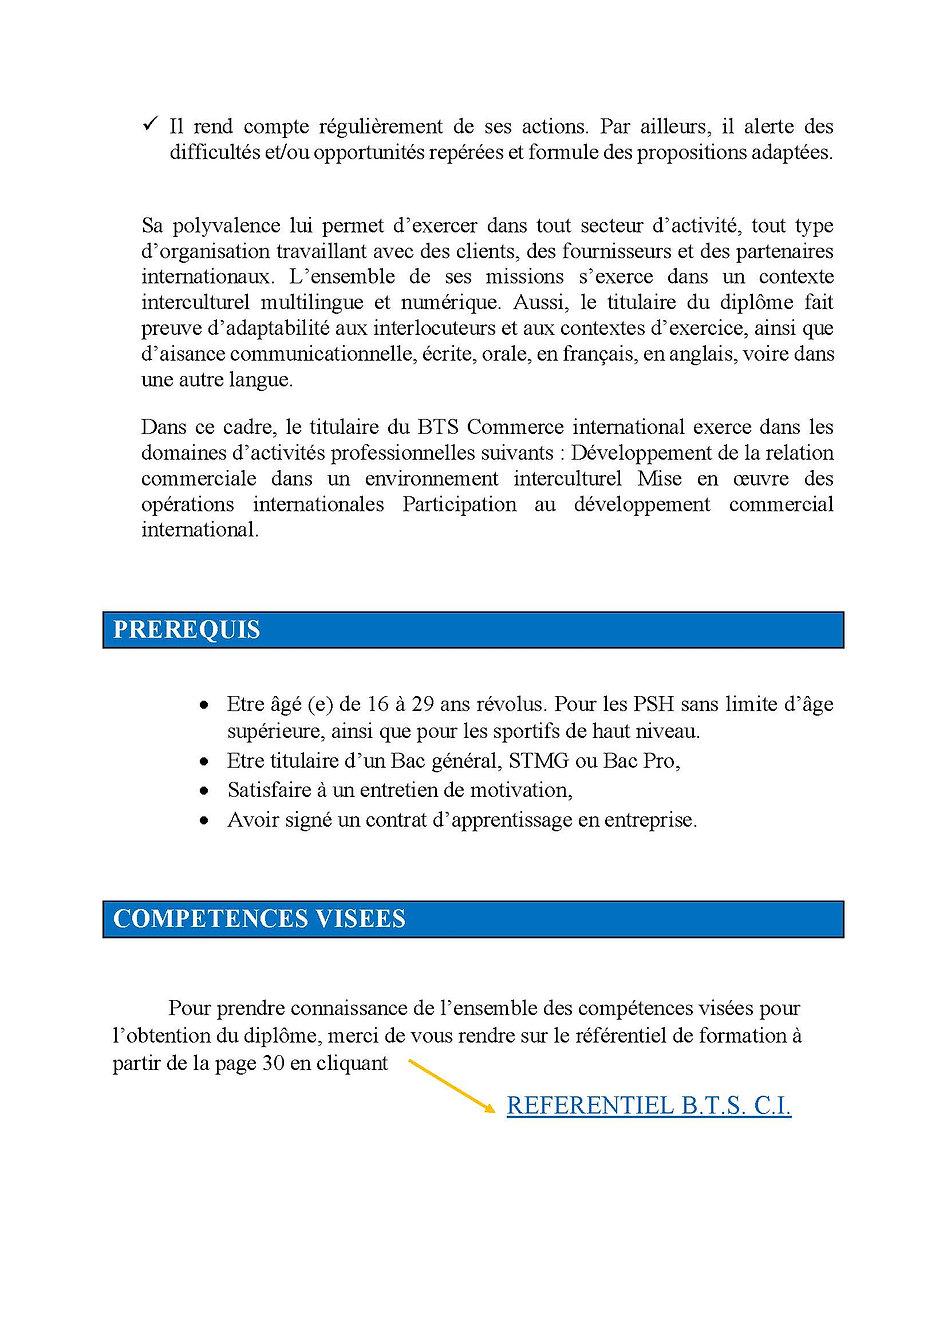 FICHE METIER DIPLOME BTS DEF_Page_2.jpg